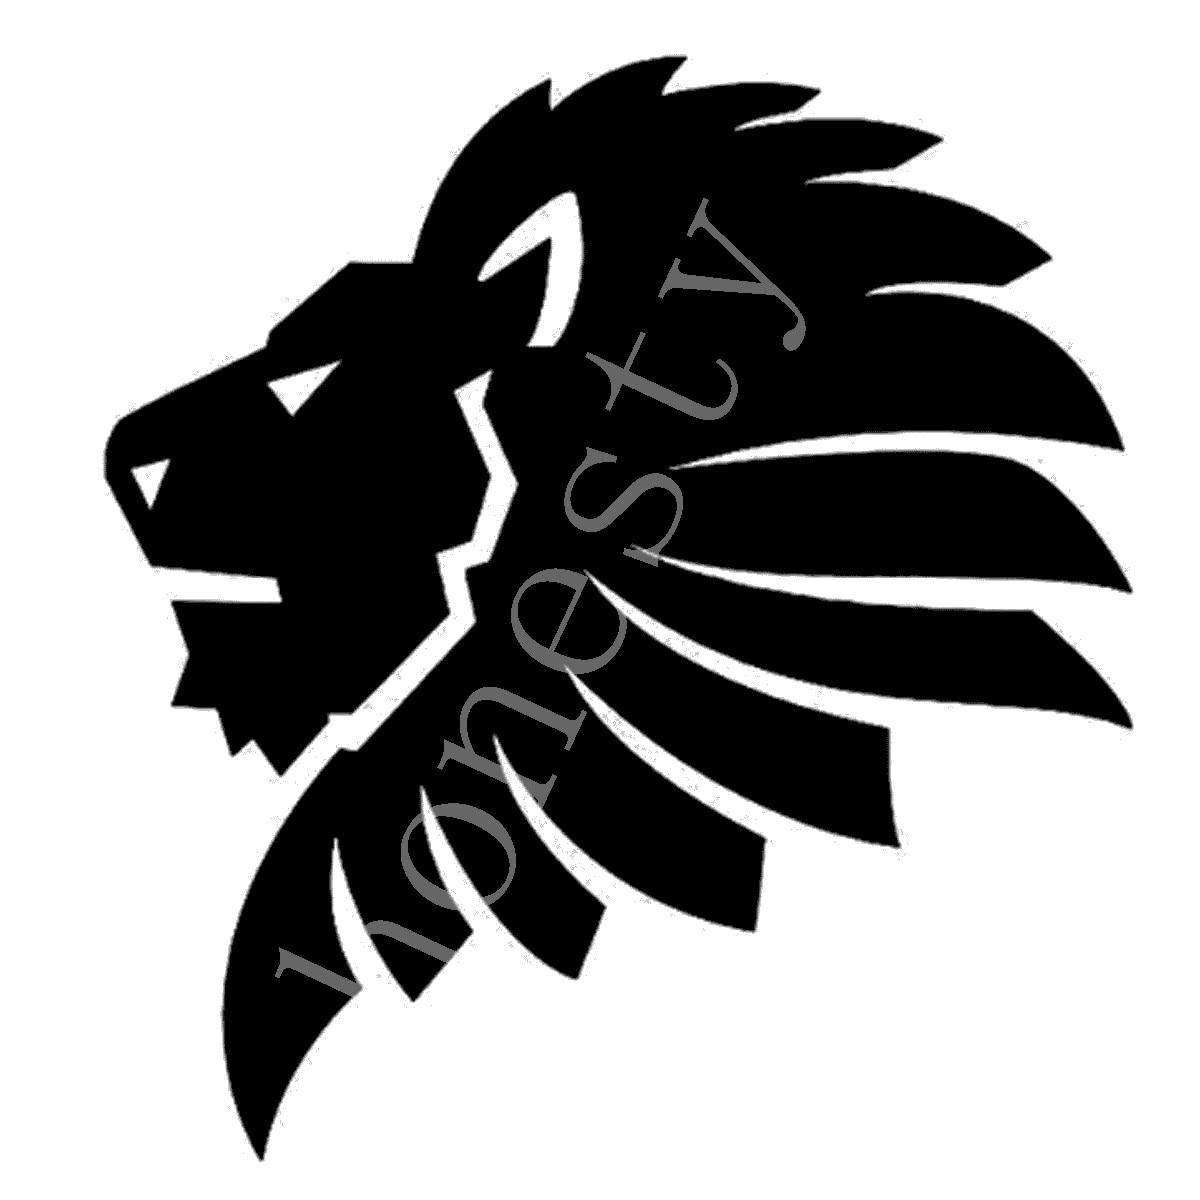 87+ Gambar Logo Hewan Hitam Putih Gratis